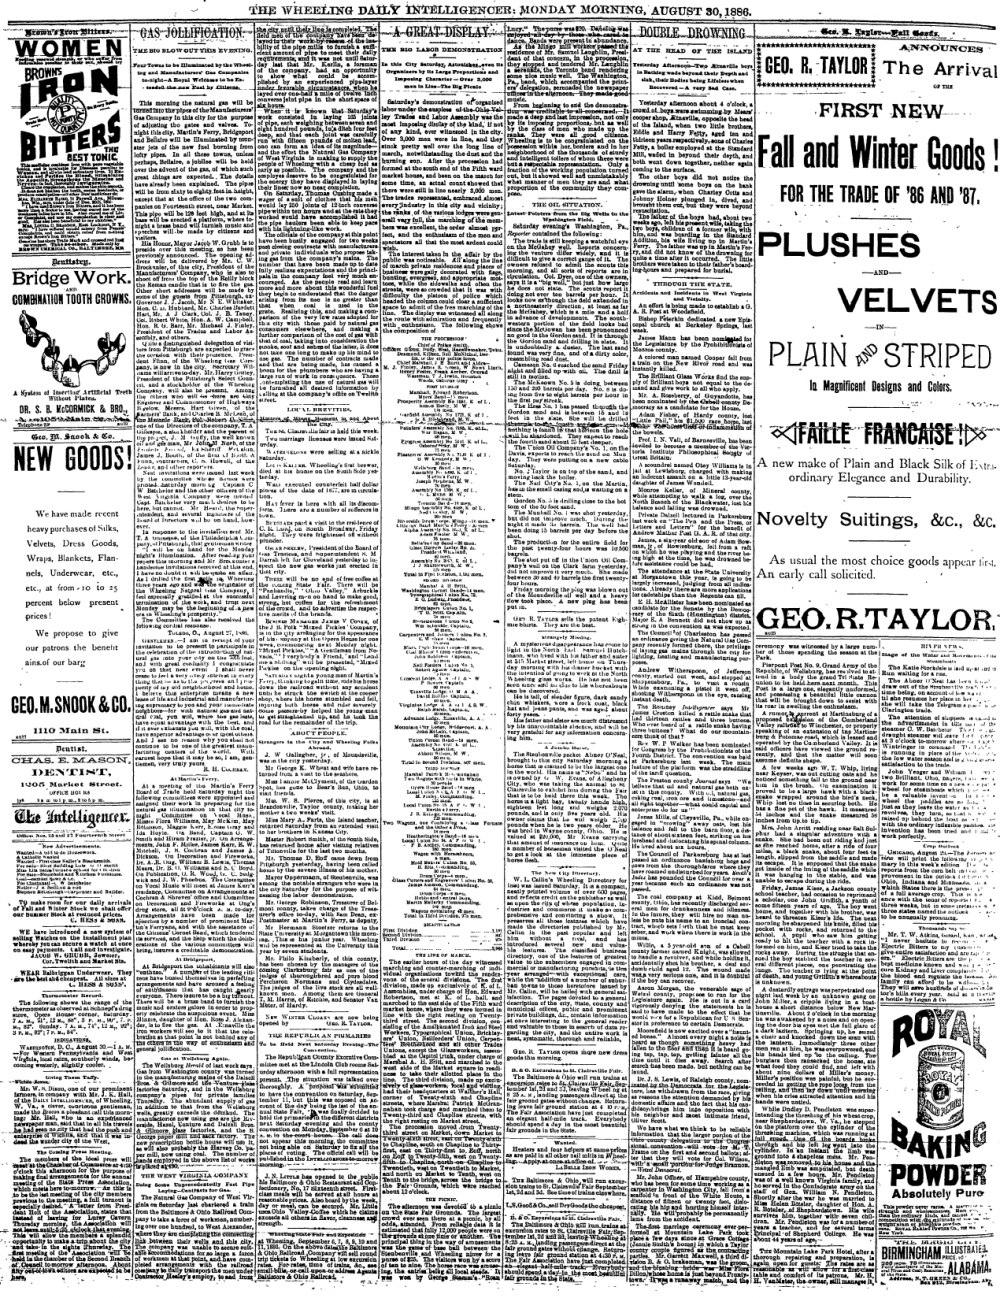 Wheeling Intelligencer, August 30, 1886, page 4